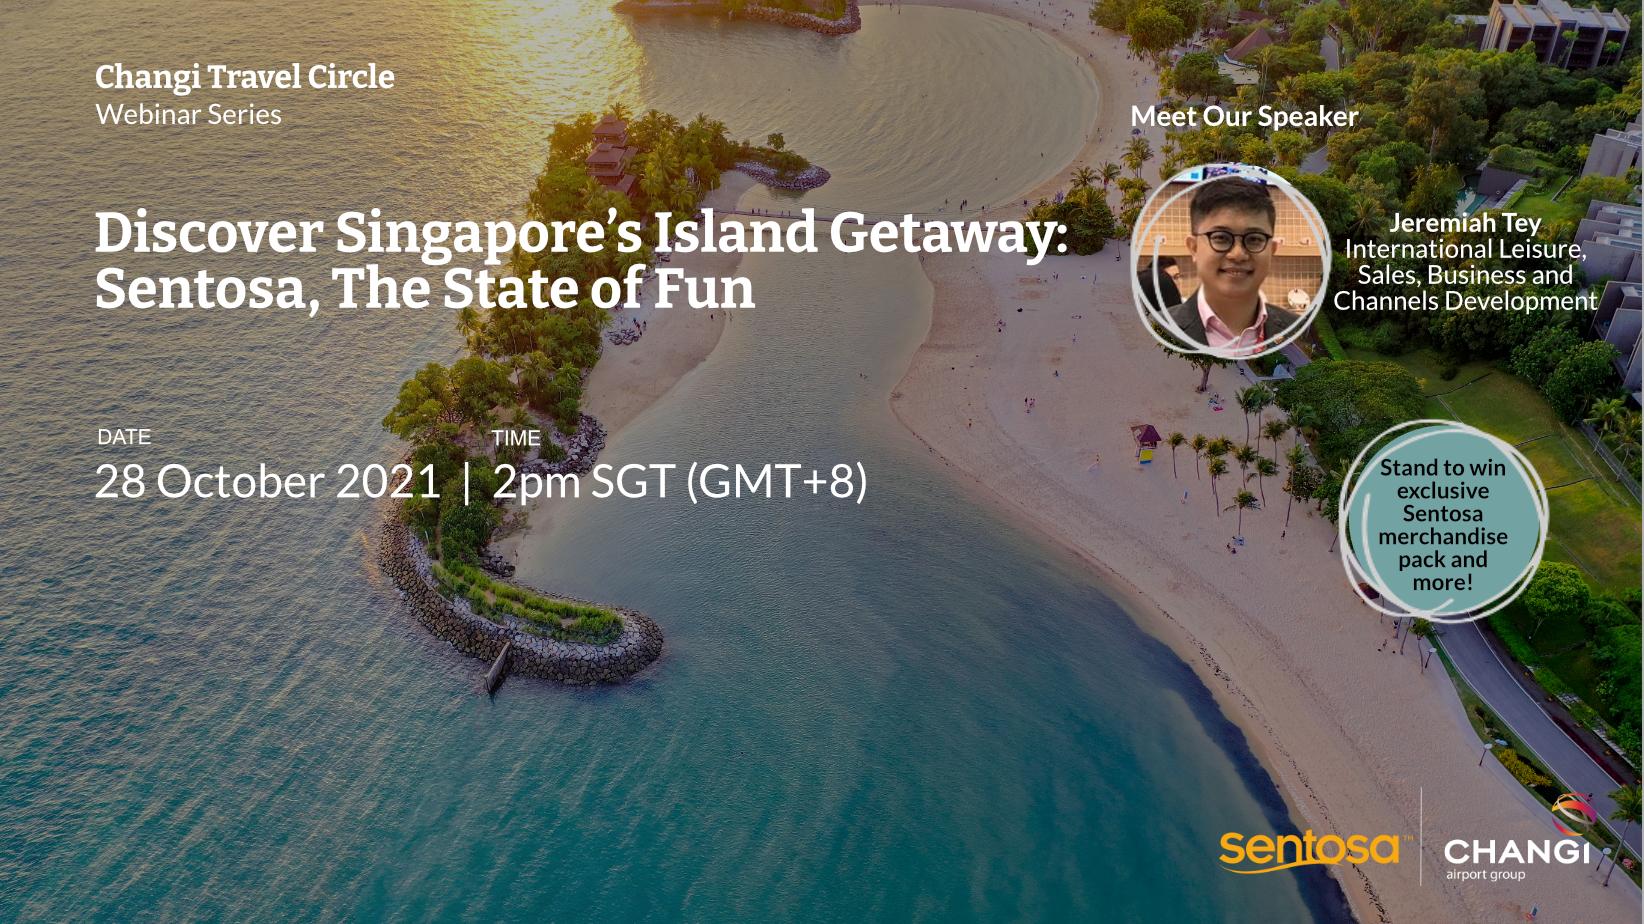 Discover Singapore's Island Getaway: Sentosa, The State of Fun